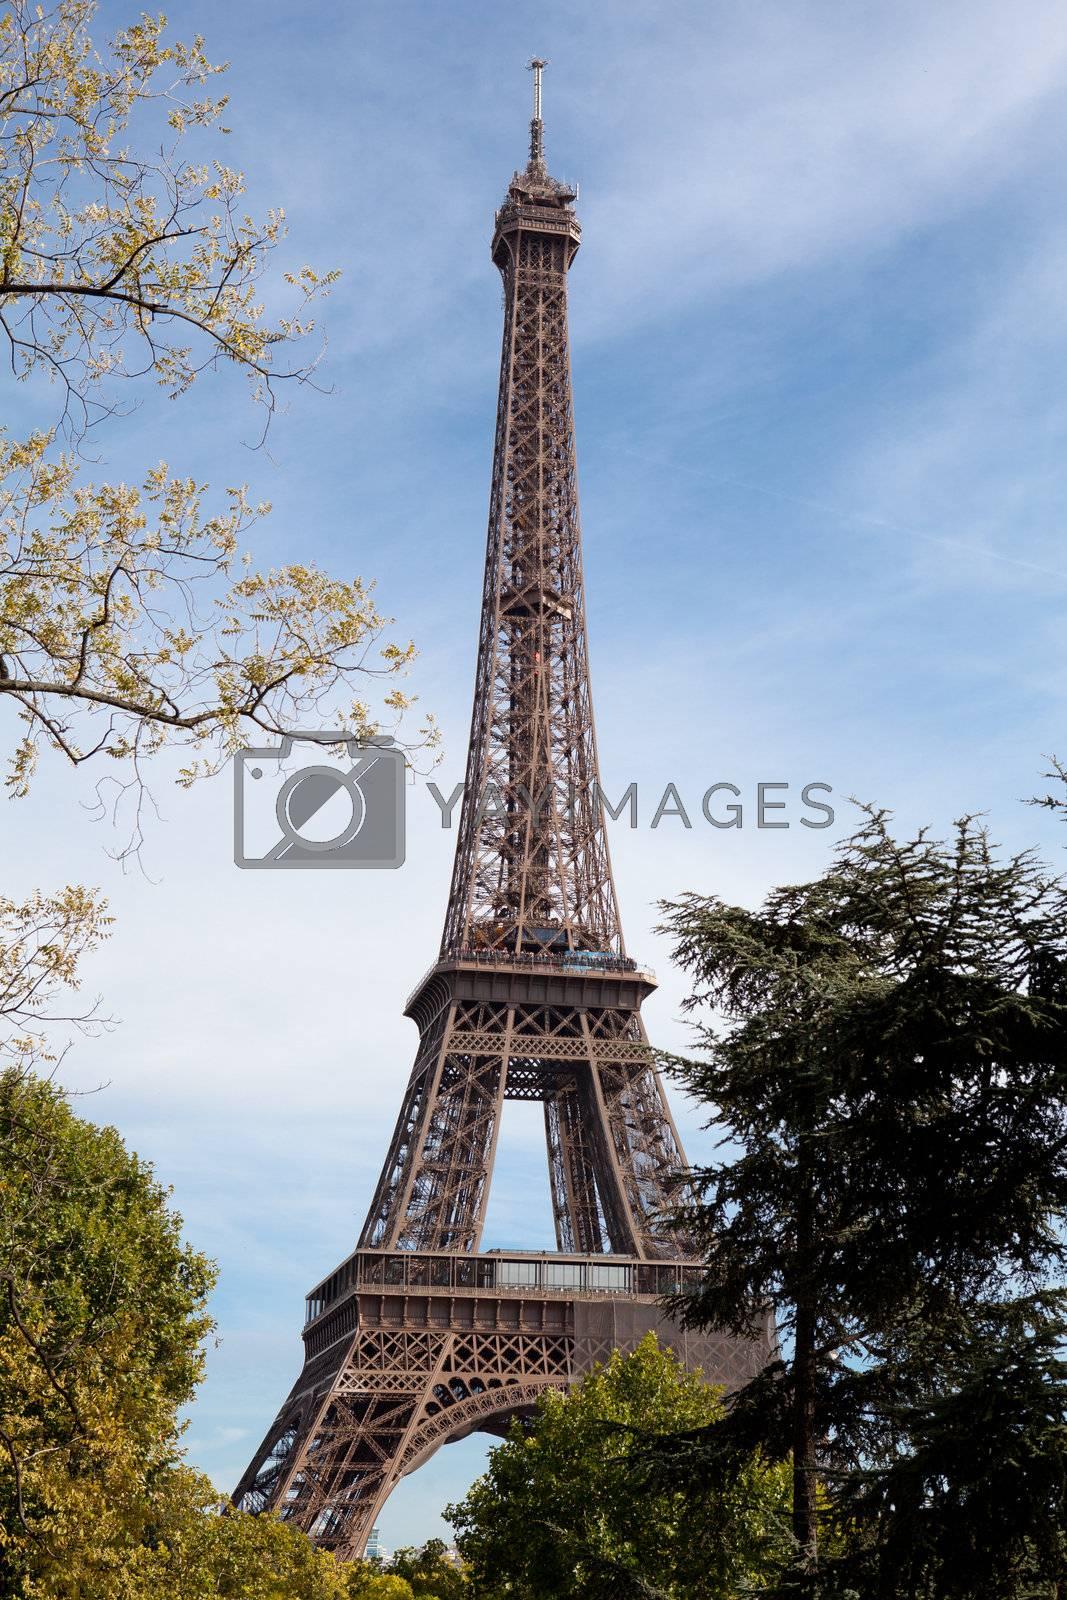 National landmark Eiffel tower through trees in Paris France by SergeyAK